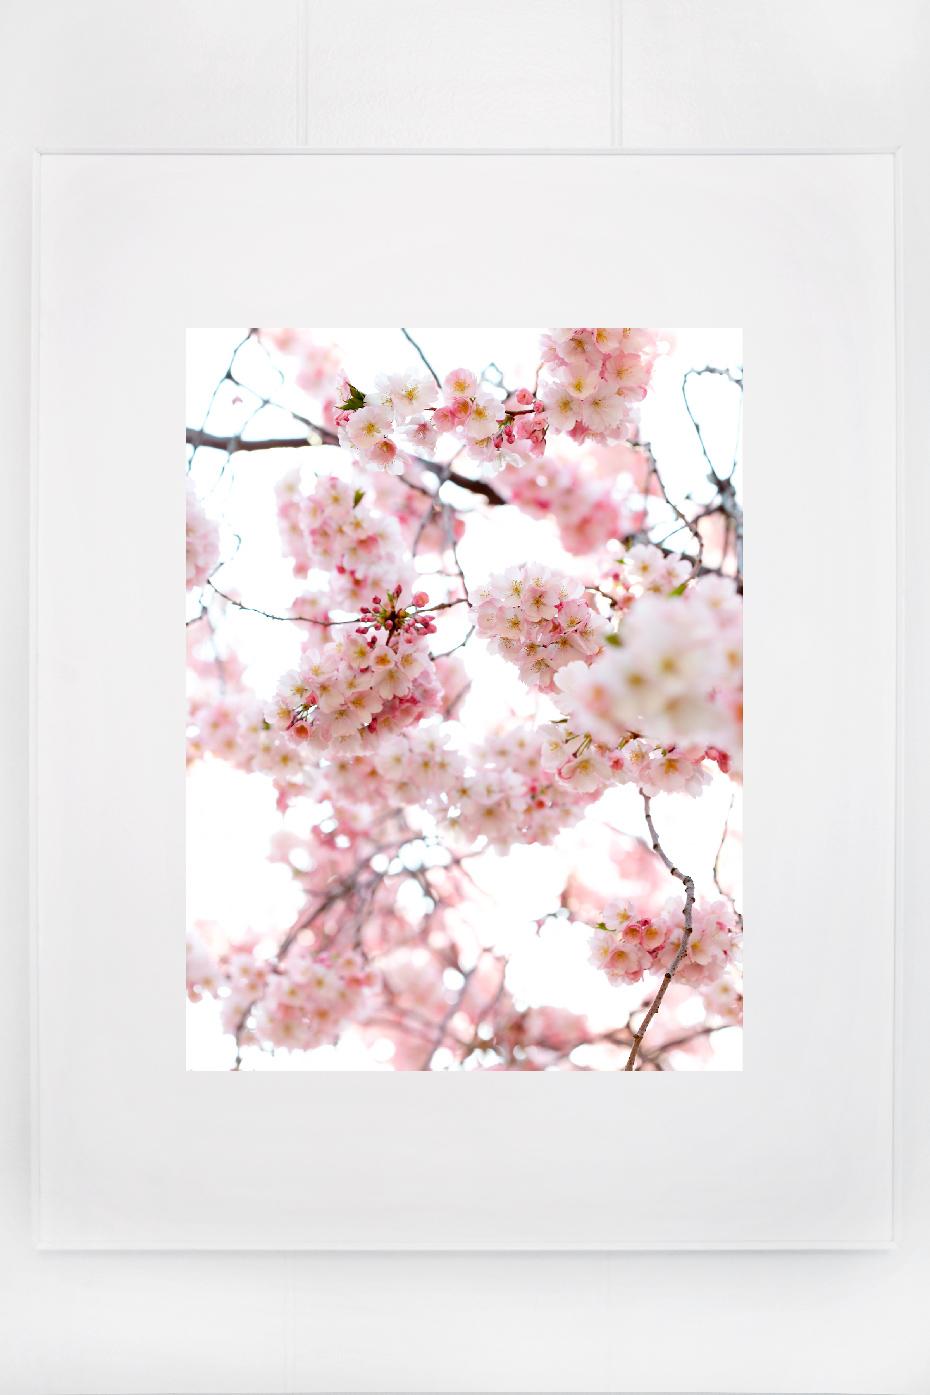 2_blossoms_I.jpg